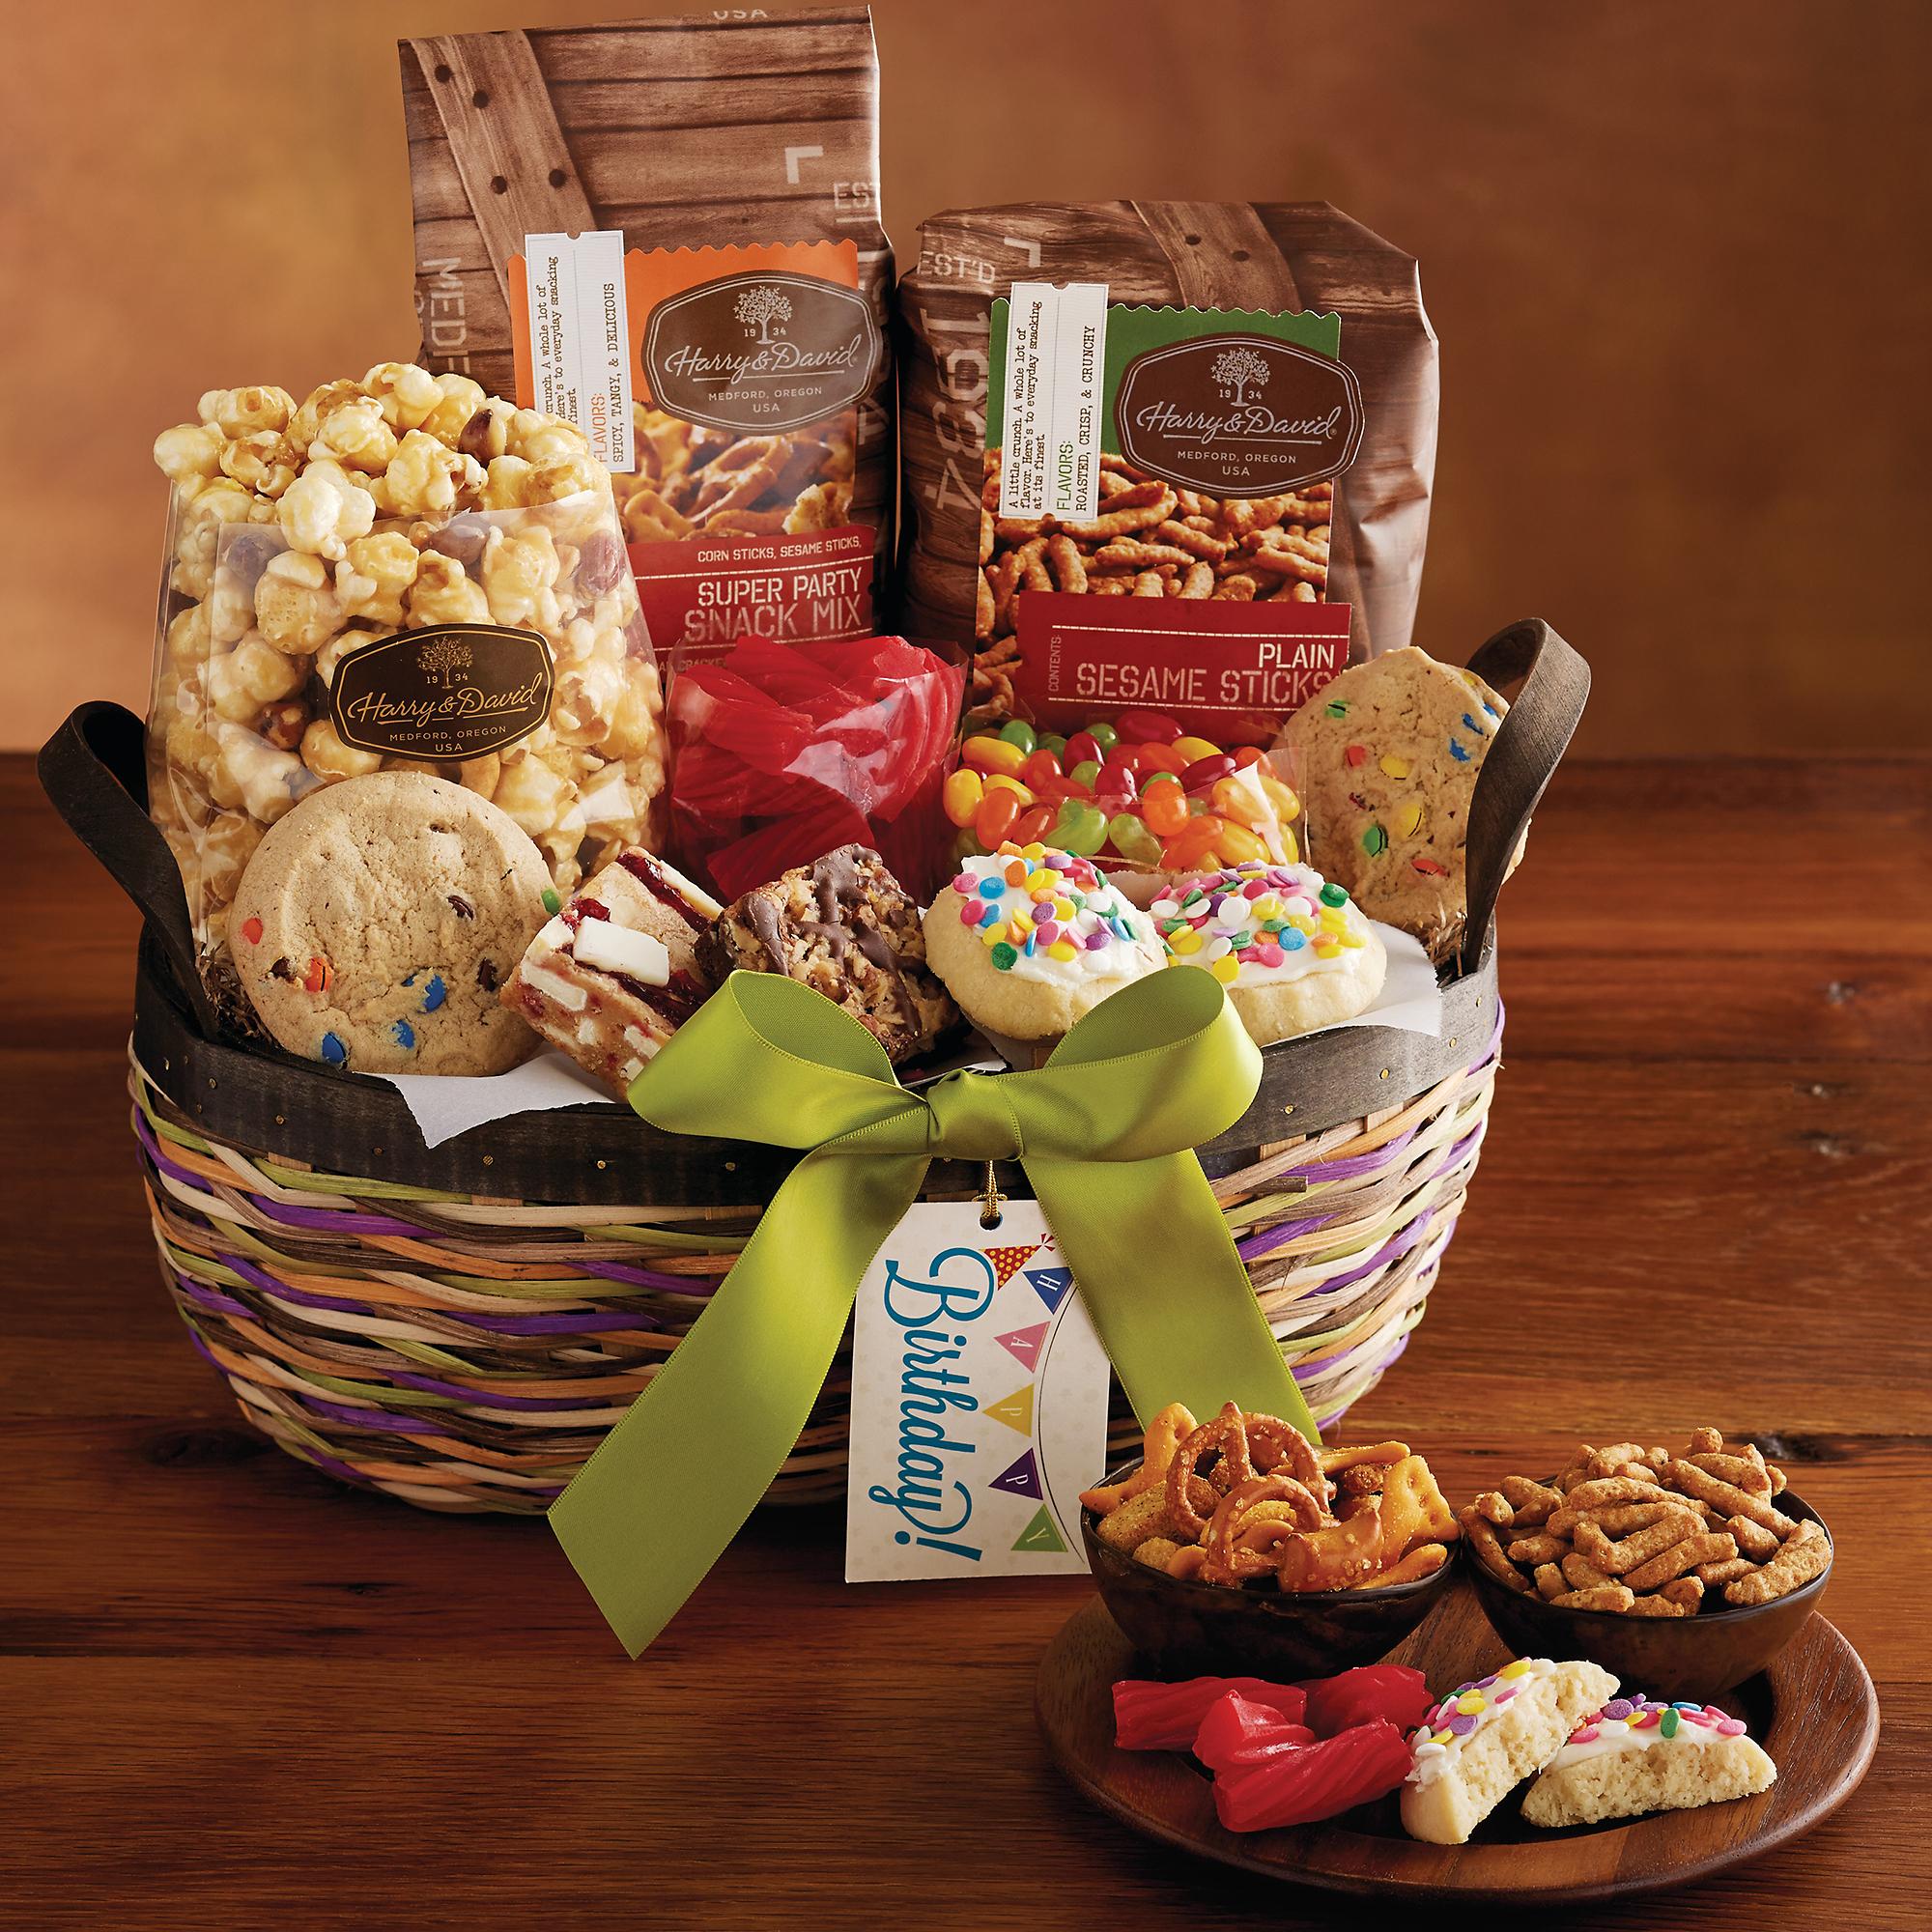 Harry And David Birthday Gift Baskets : Birthday basket business gifts harry david